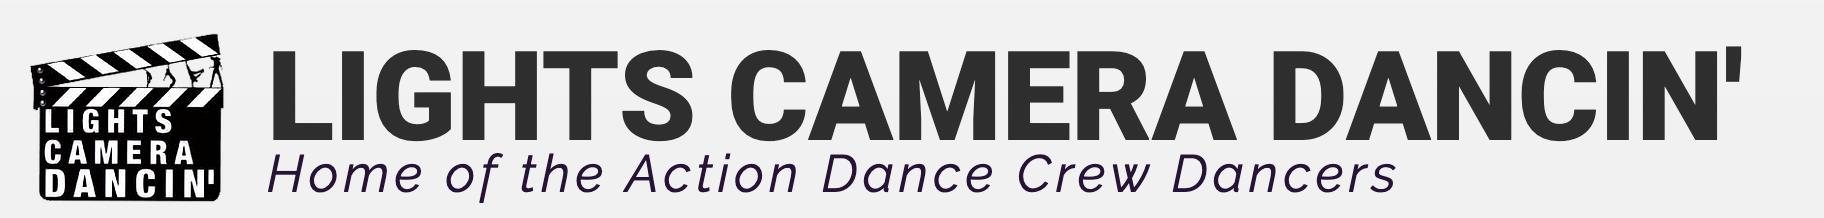 Lights Camera Dancin